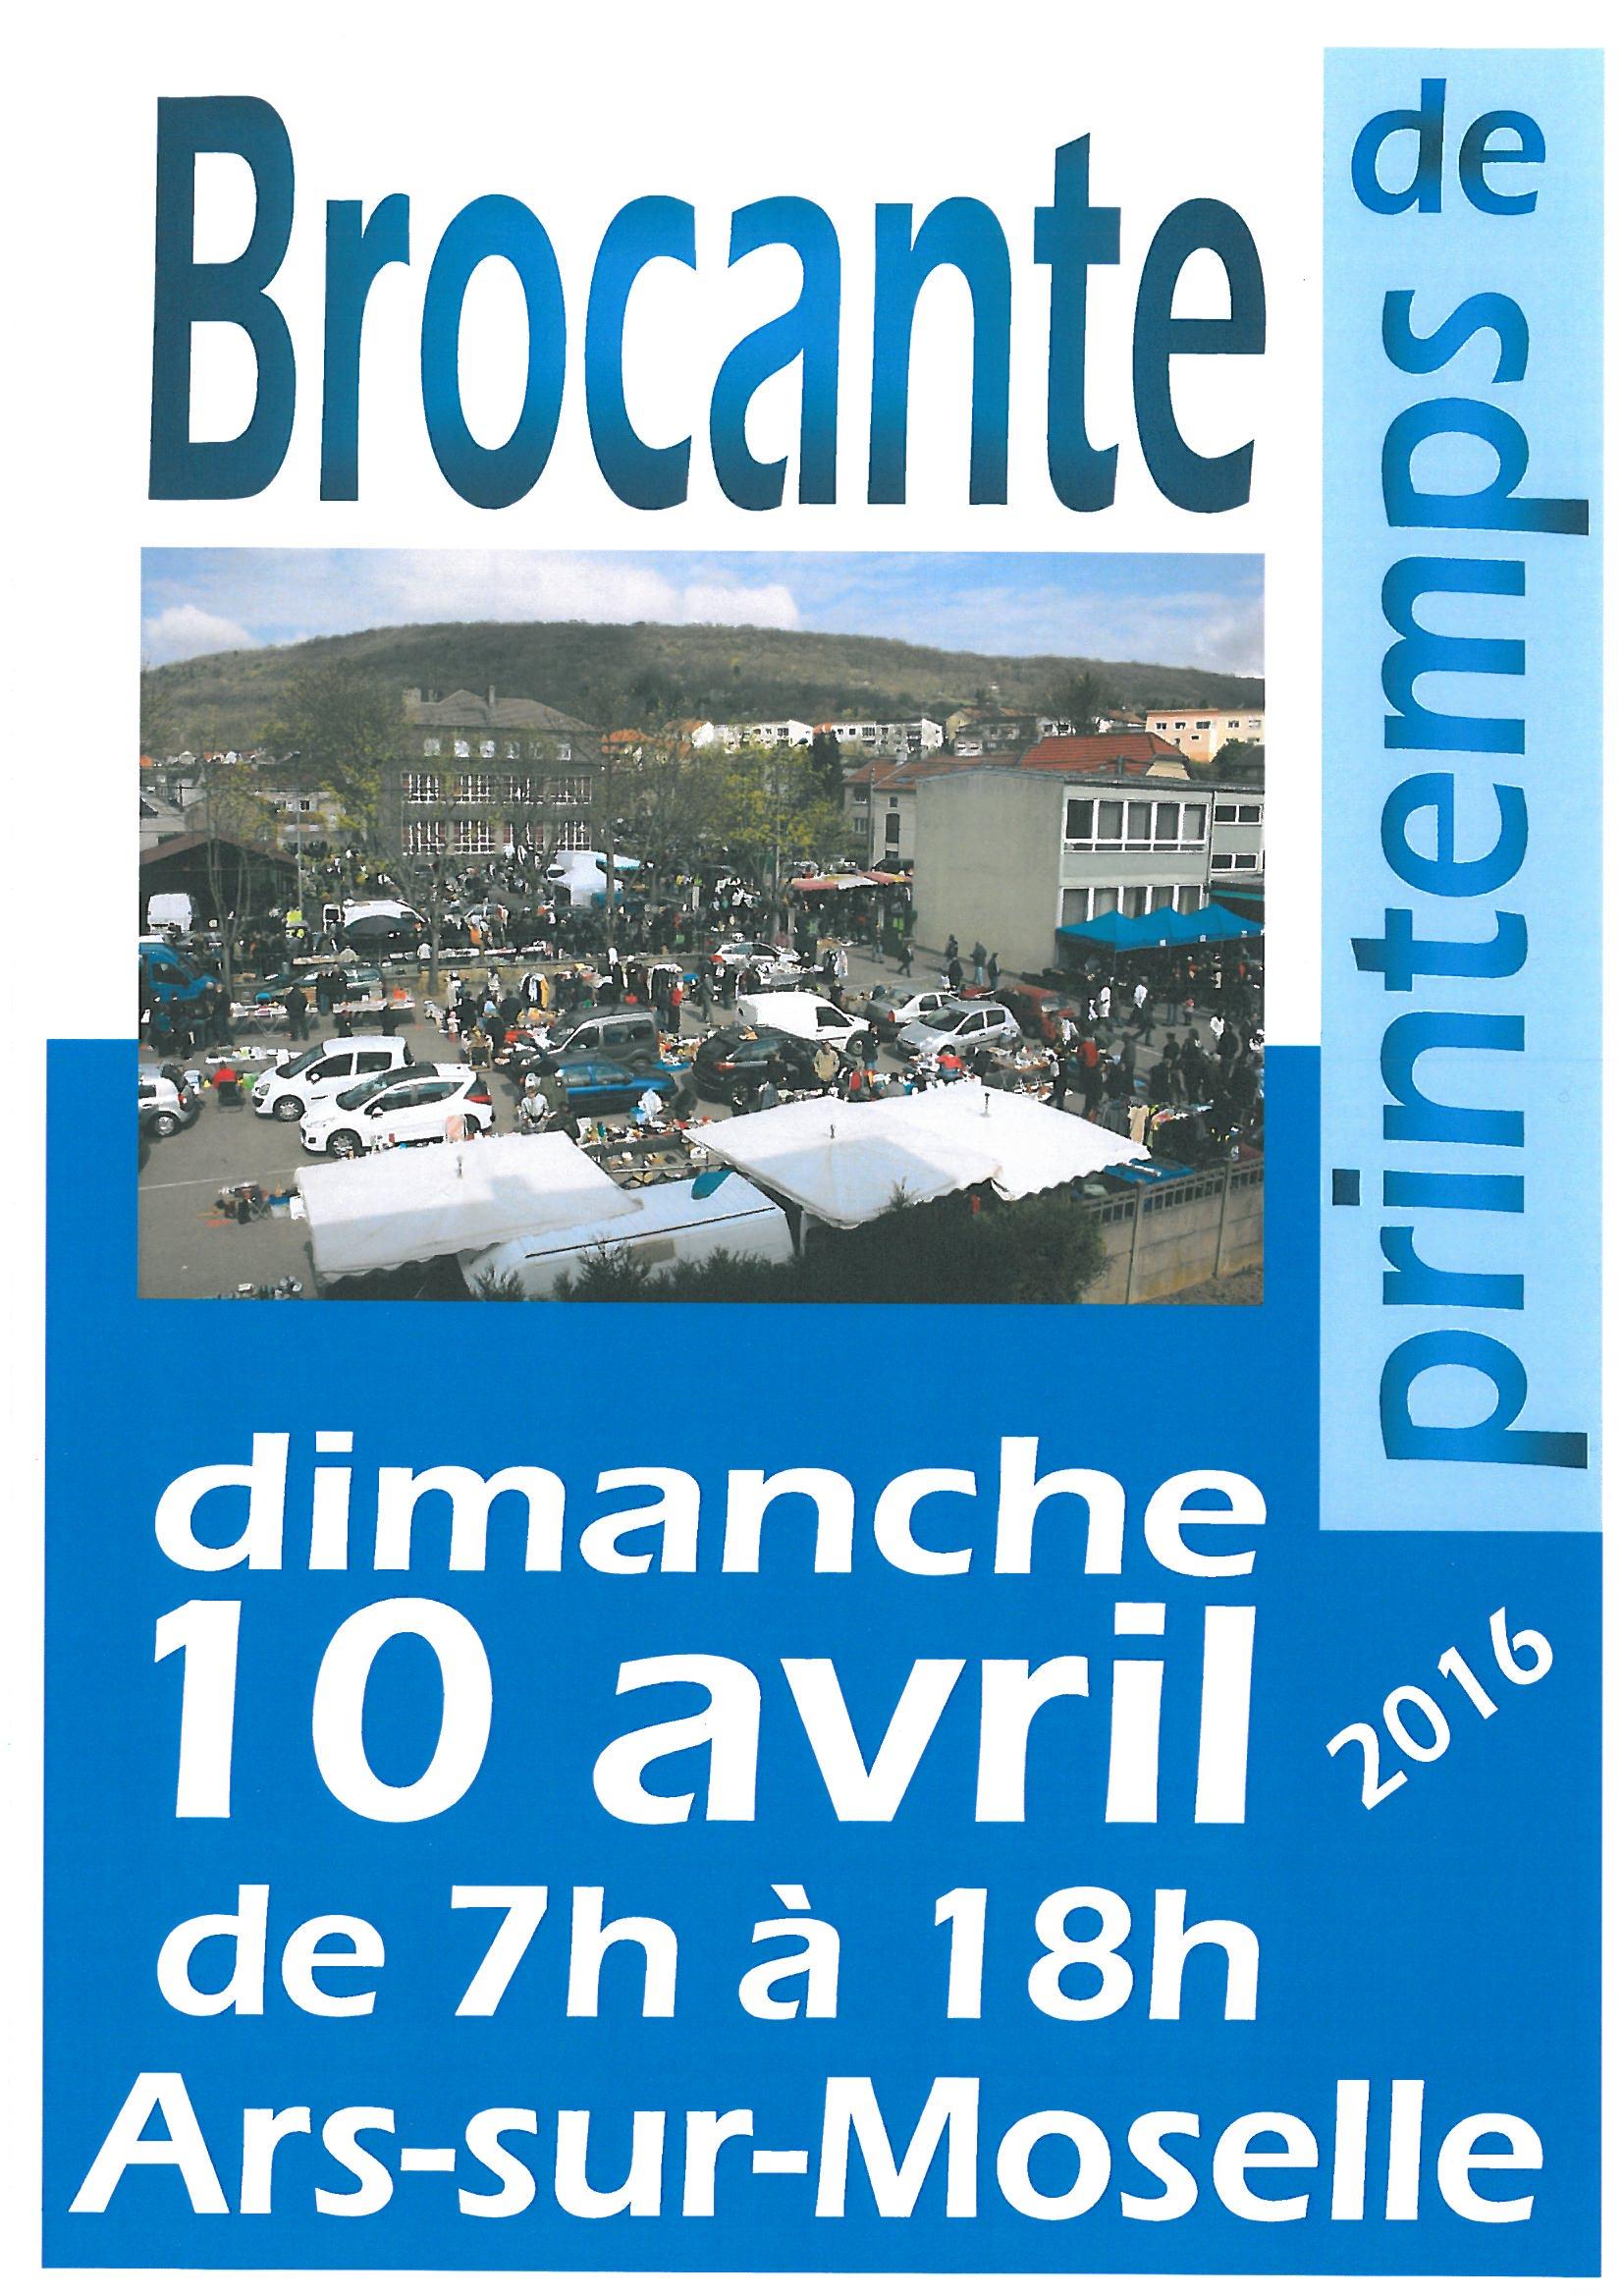 GRANDE BROCANTE DE PRINTEMPS dimanche 10 avril